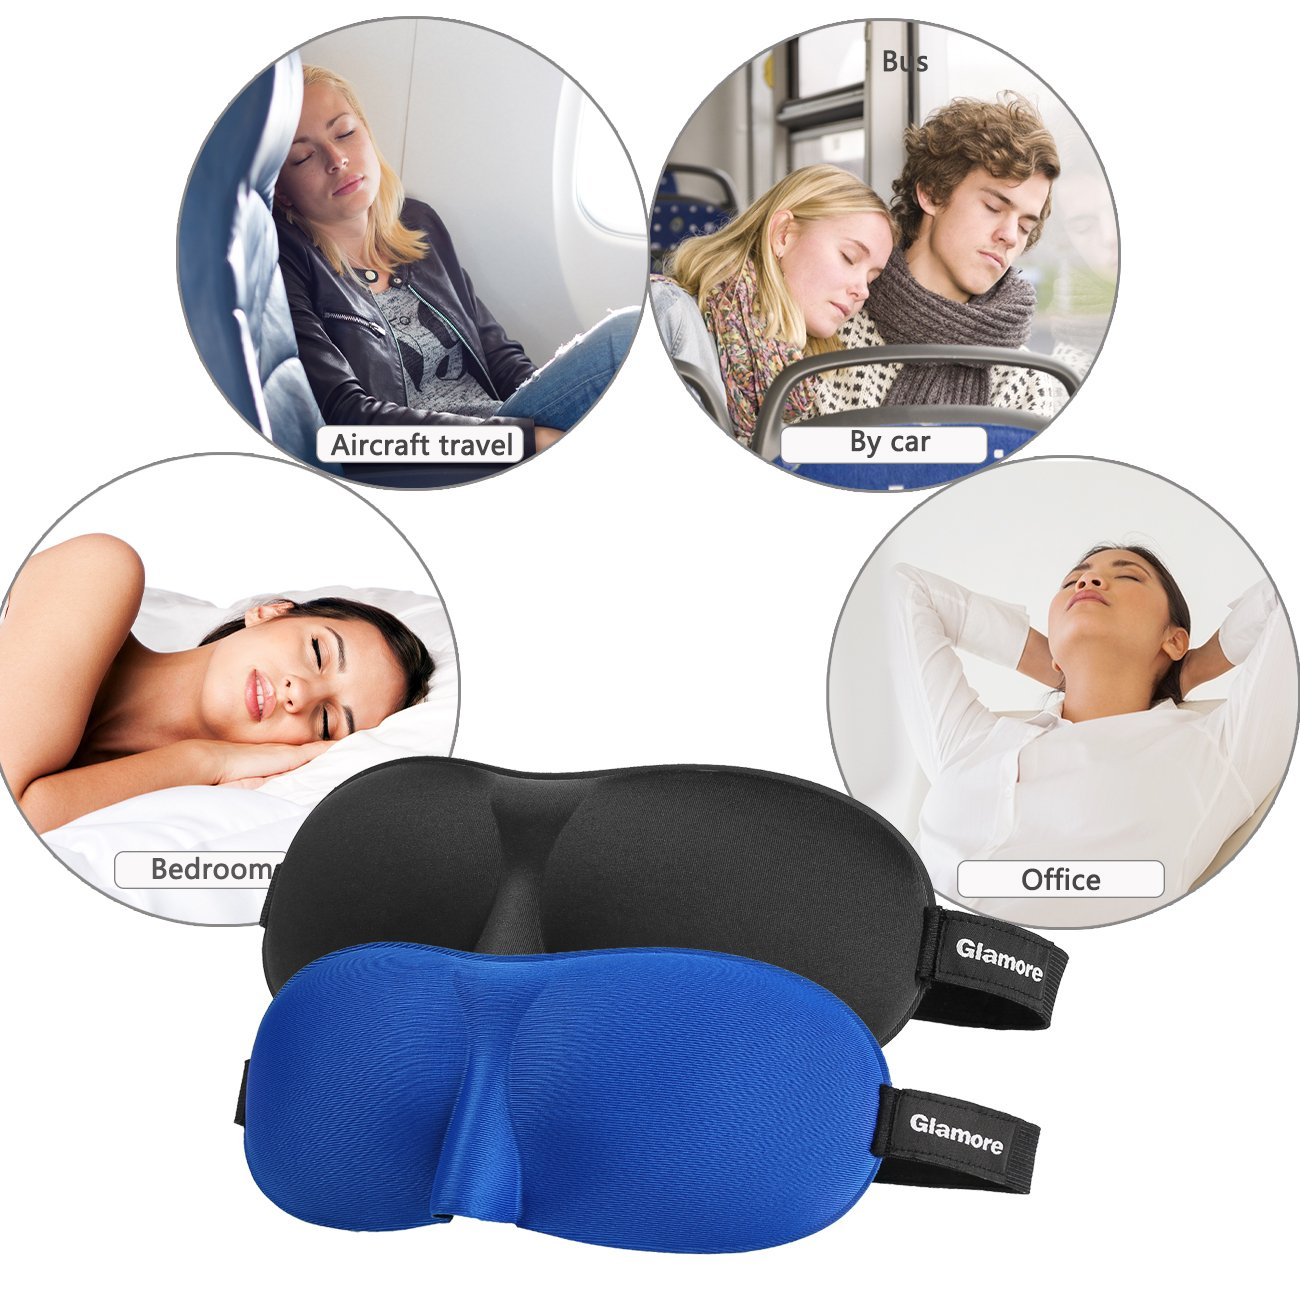 Sleep Mask, Glamore Pack of 2 Eye Mask for Sleeping Lightweight Super Soft Adjustable 3D Contoured Compact for Travel, Shift Work, Naps, Night Eyeshades Blinder for Men and Women